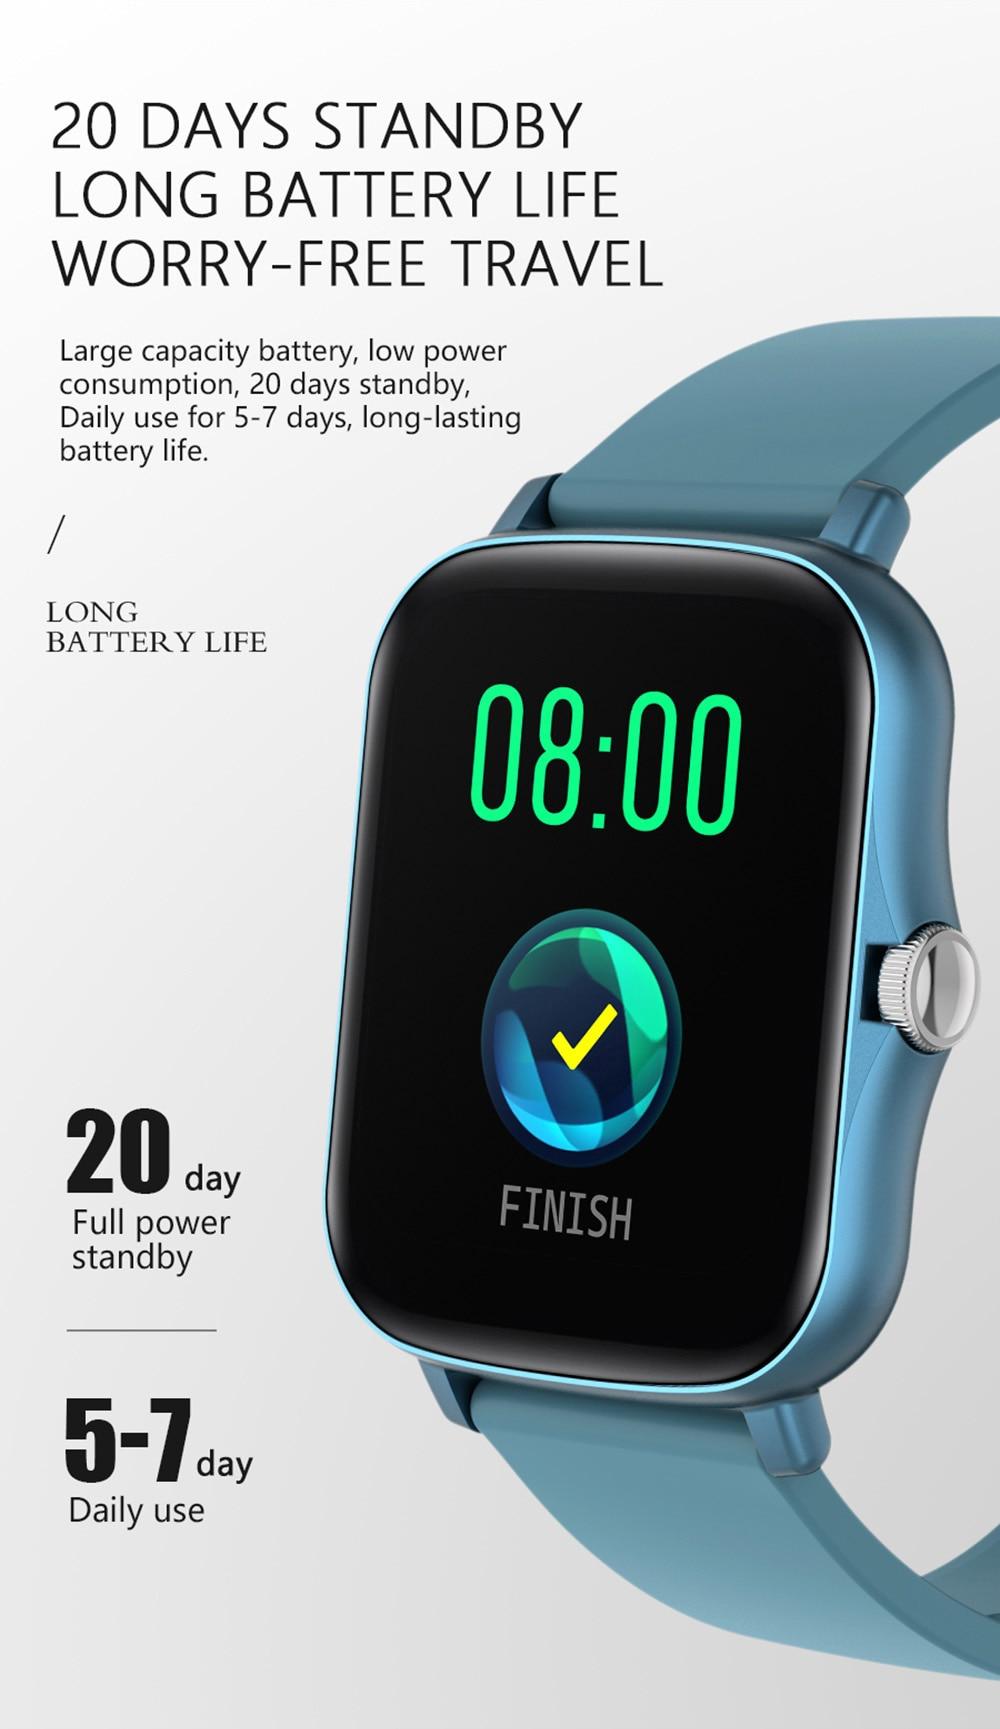 Hd857a4e26dfb47abb375279ff65fa1ebV COLMI P8 Plus 1.69 inch 2021 Smart Watch Men Full Touch Fitness Tracker IP67 waterproof Women GTS 2 Smartwatch for Xiaomi phone